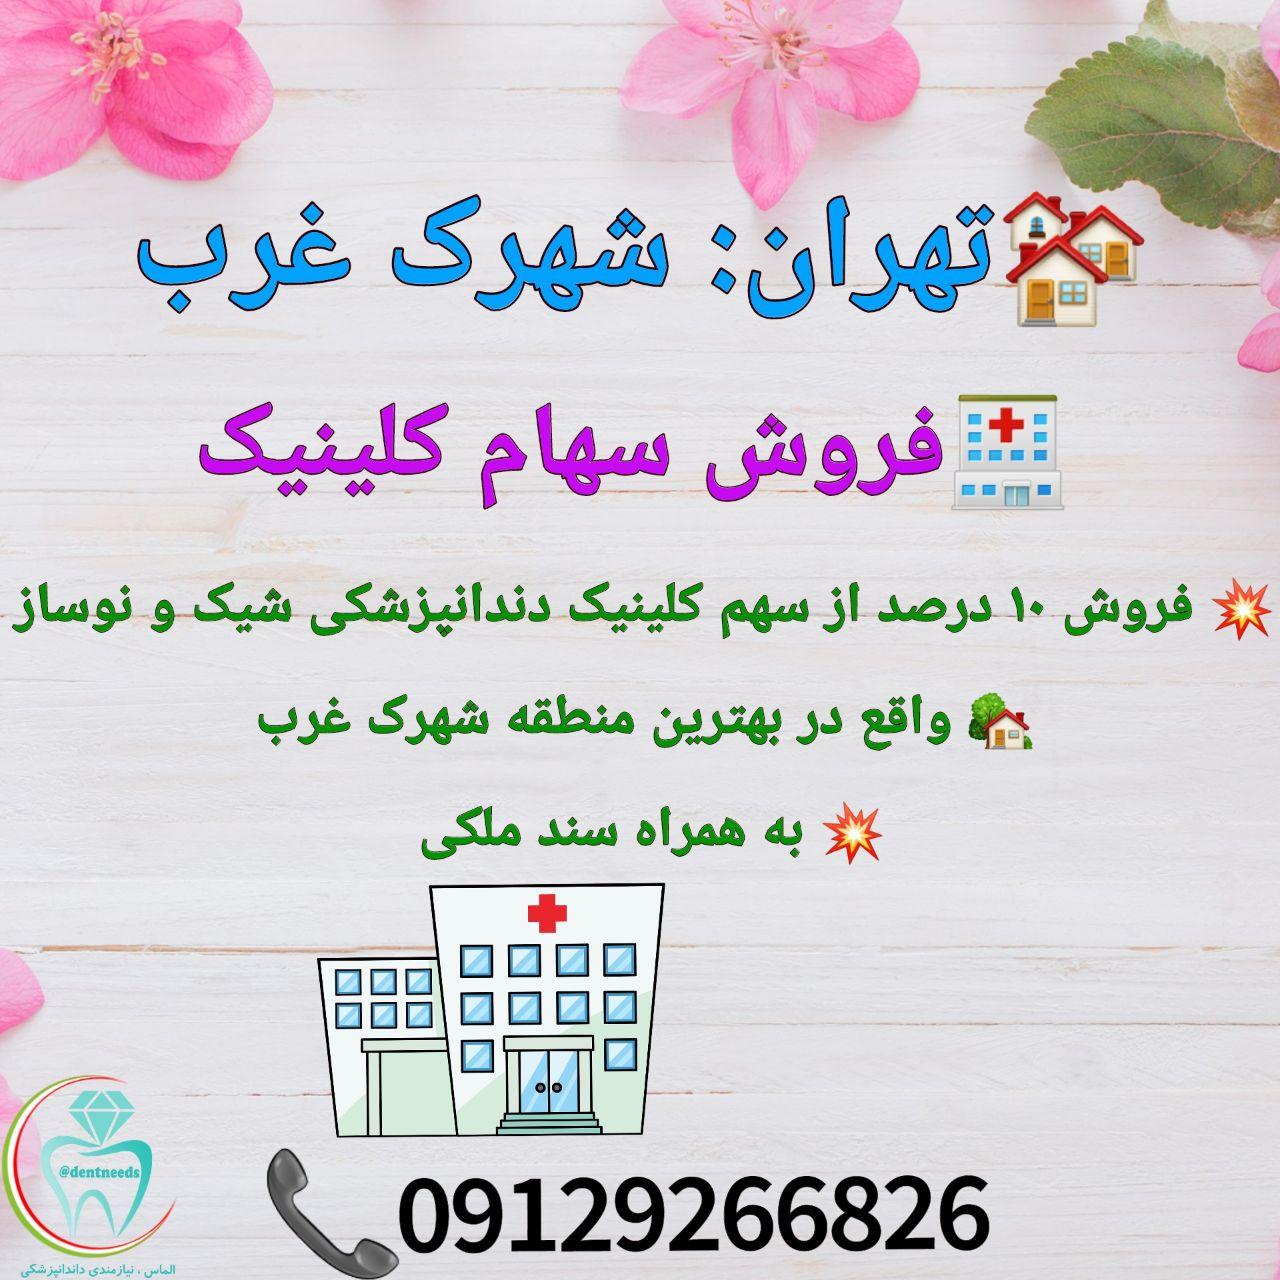 تهران: شهرک غرب، فروش سهام کلینیک